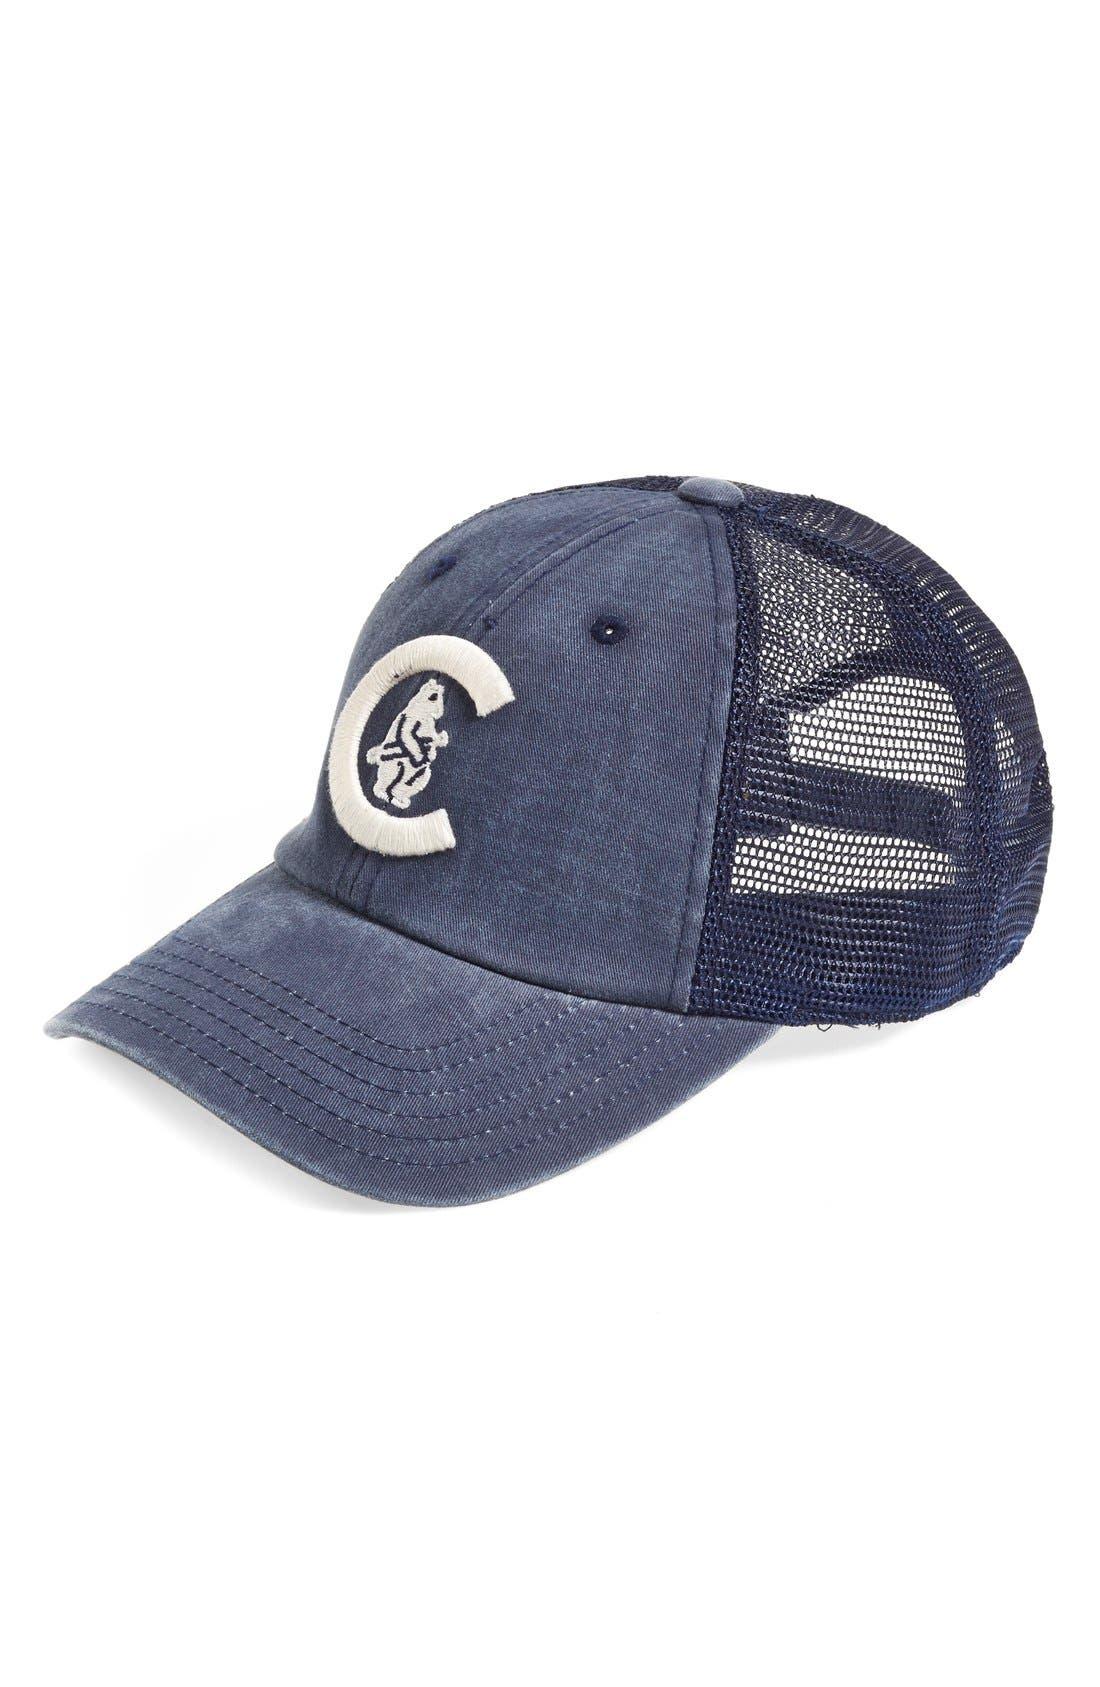 'Chicago Cubs - Raglan Bones' Mesh Trucker Cap,                         Main,                         color, Navy